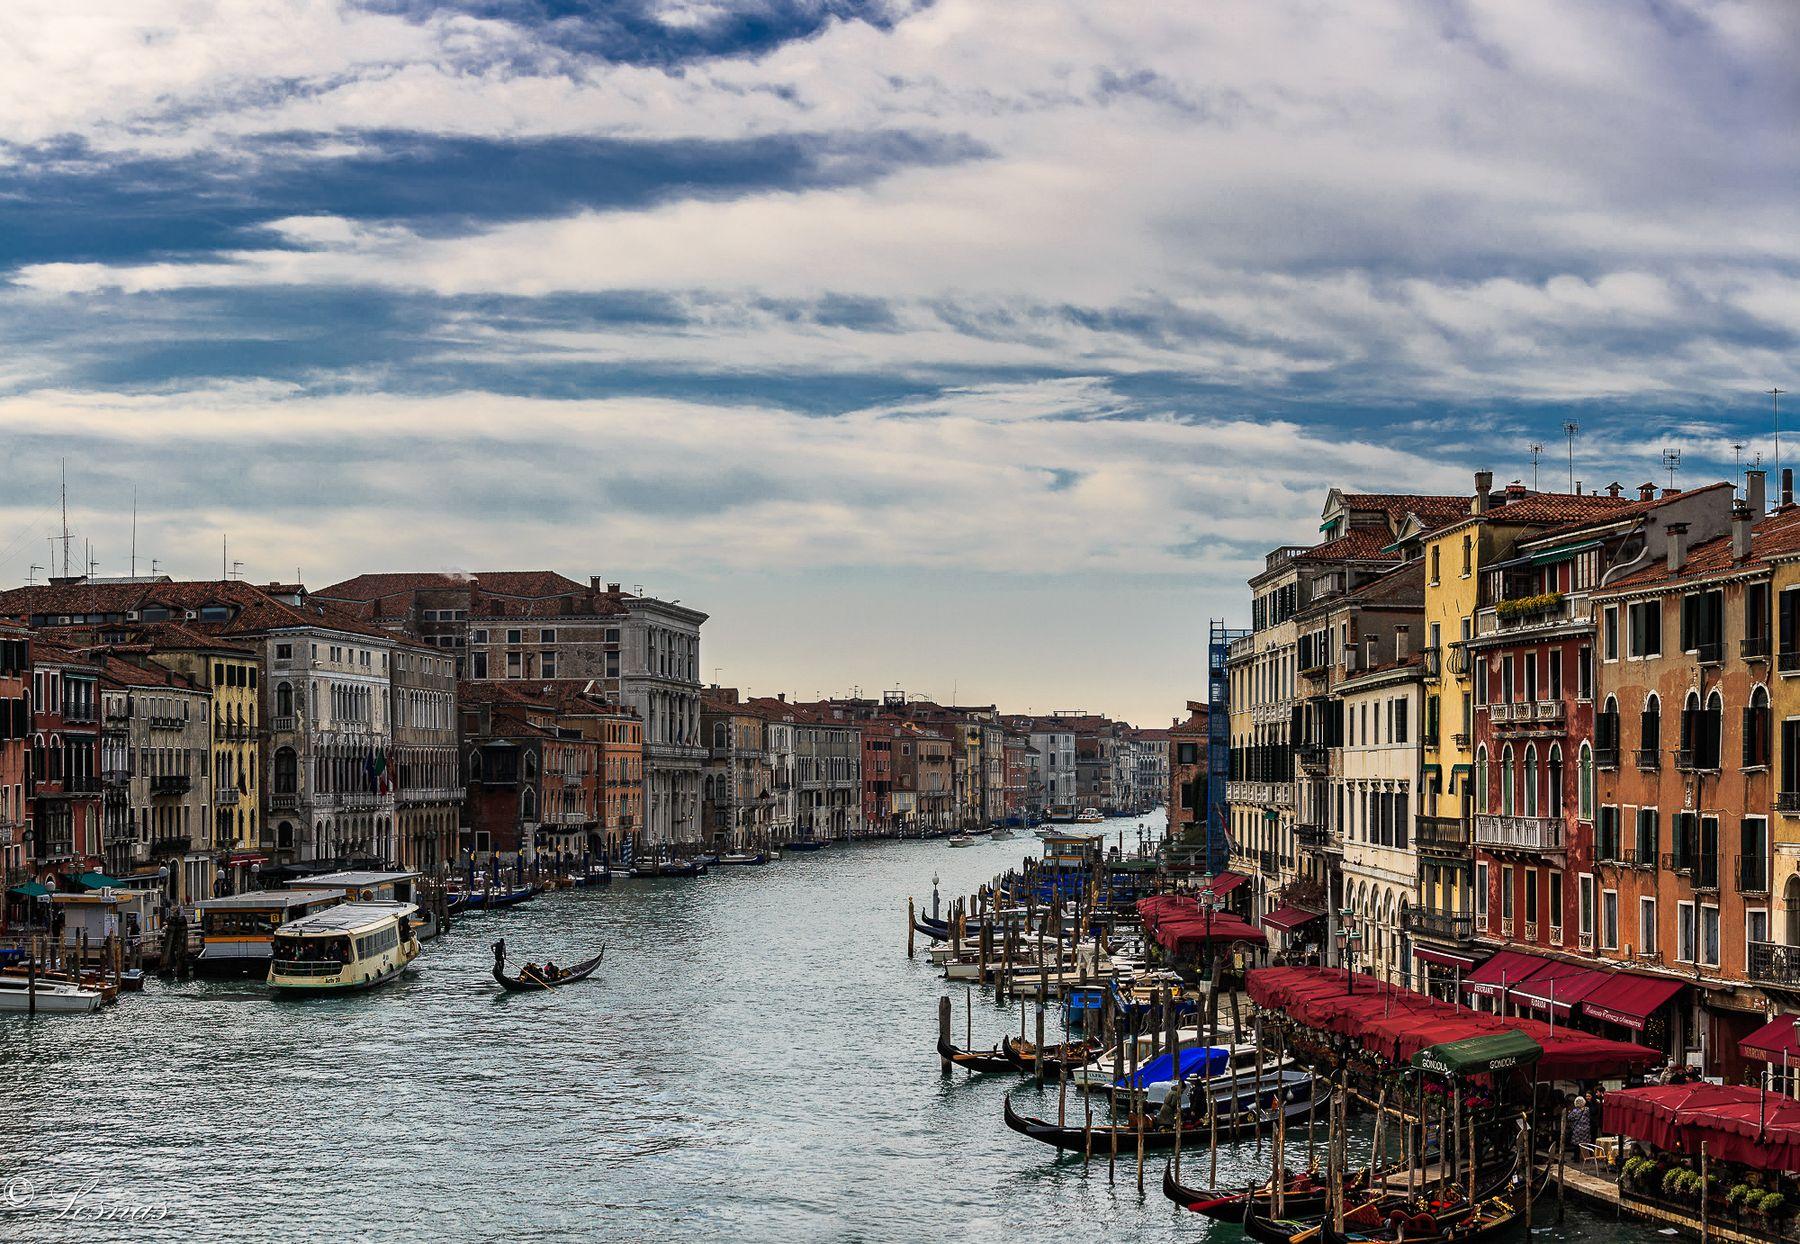 Гранд-Канал в Венеции. 2018 г.